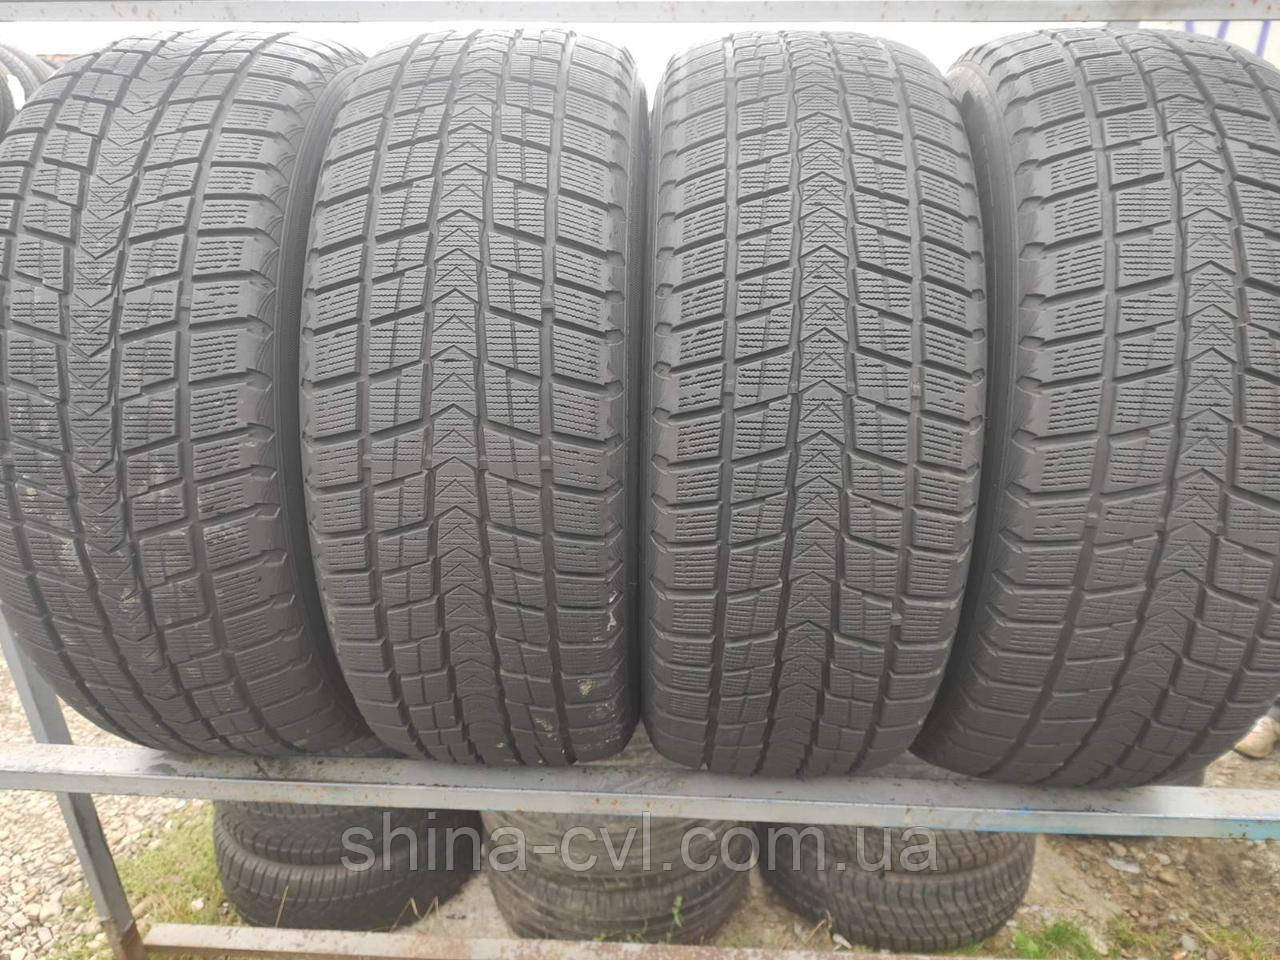 Зимові шини 265/60 R18 110Q NEXEN WIN GUARD ICE SUV